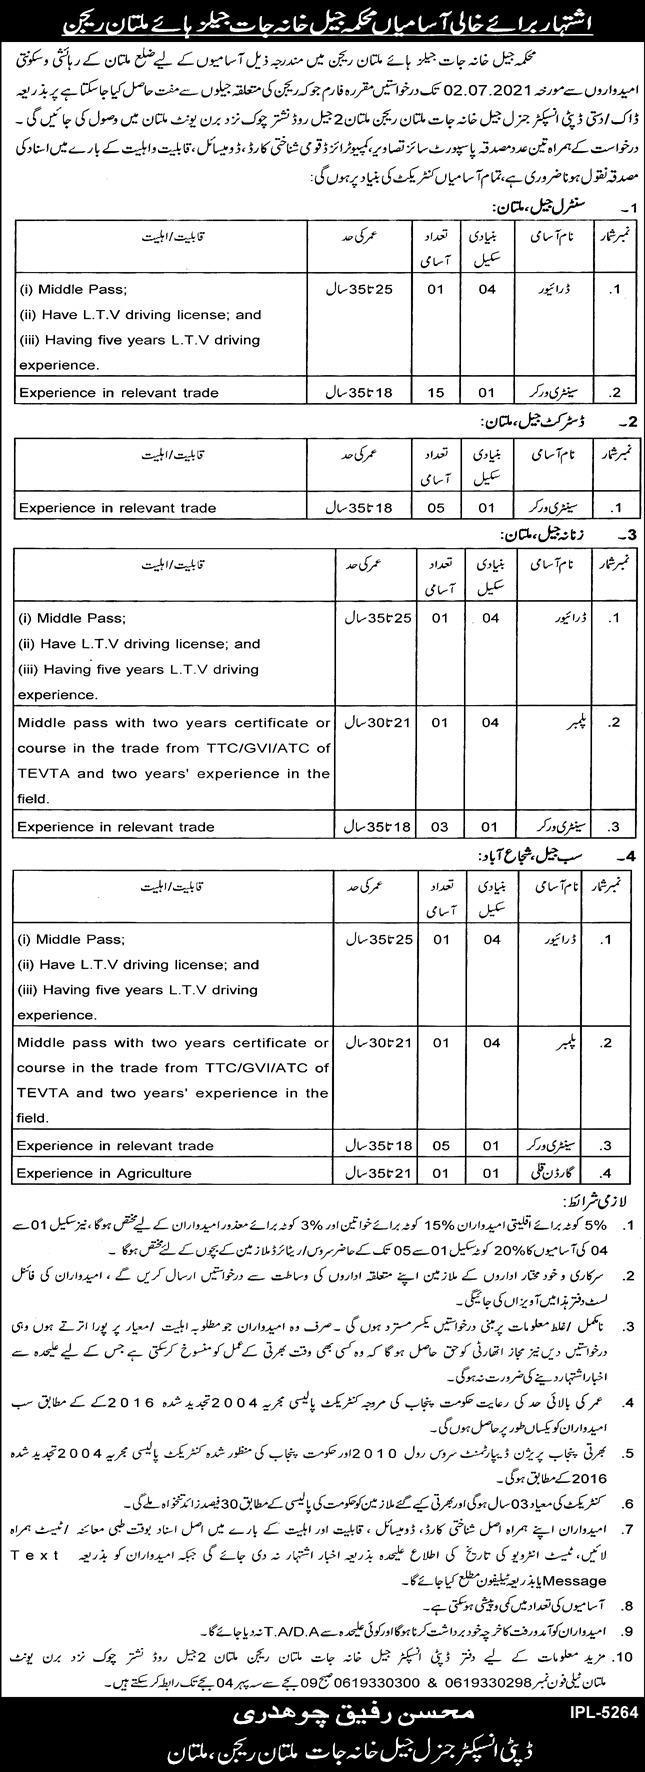 Jail Khana Jat Department Multan Jobs 2021 in Pakistan